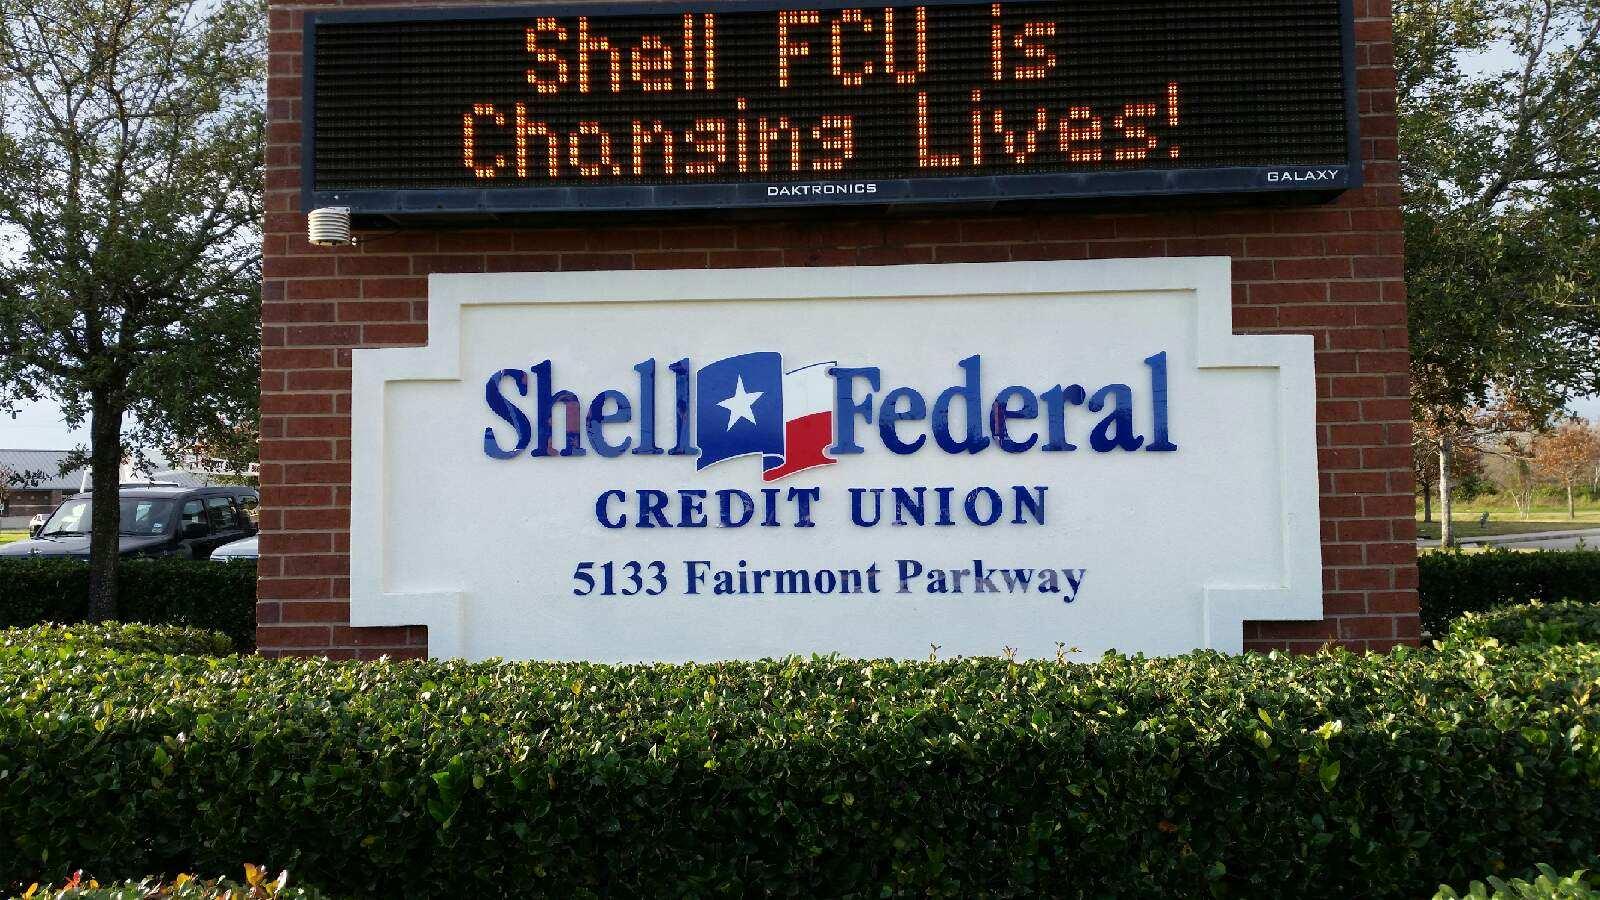 Shell Federal Credit Union - I.D. Monument & LED Digital Sign